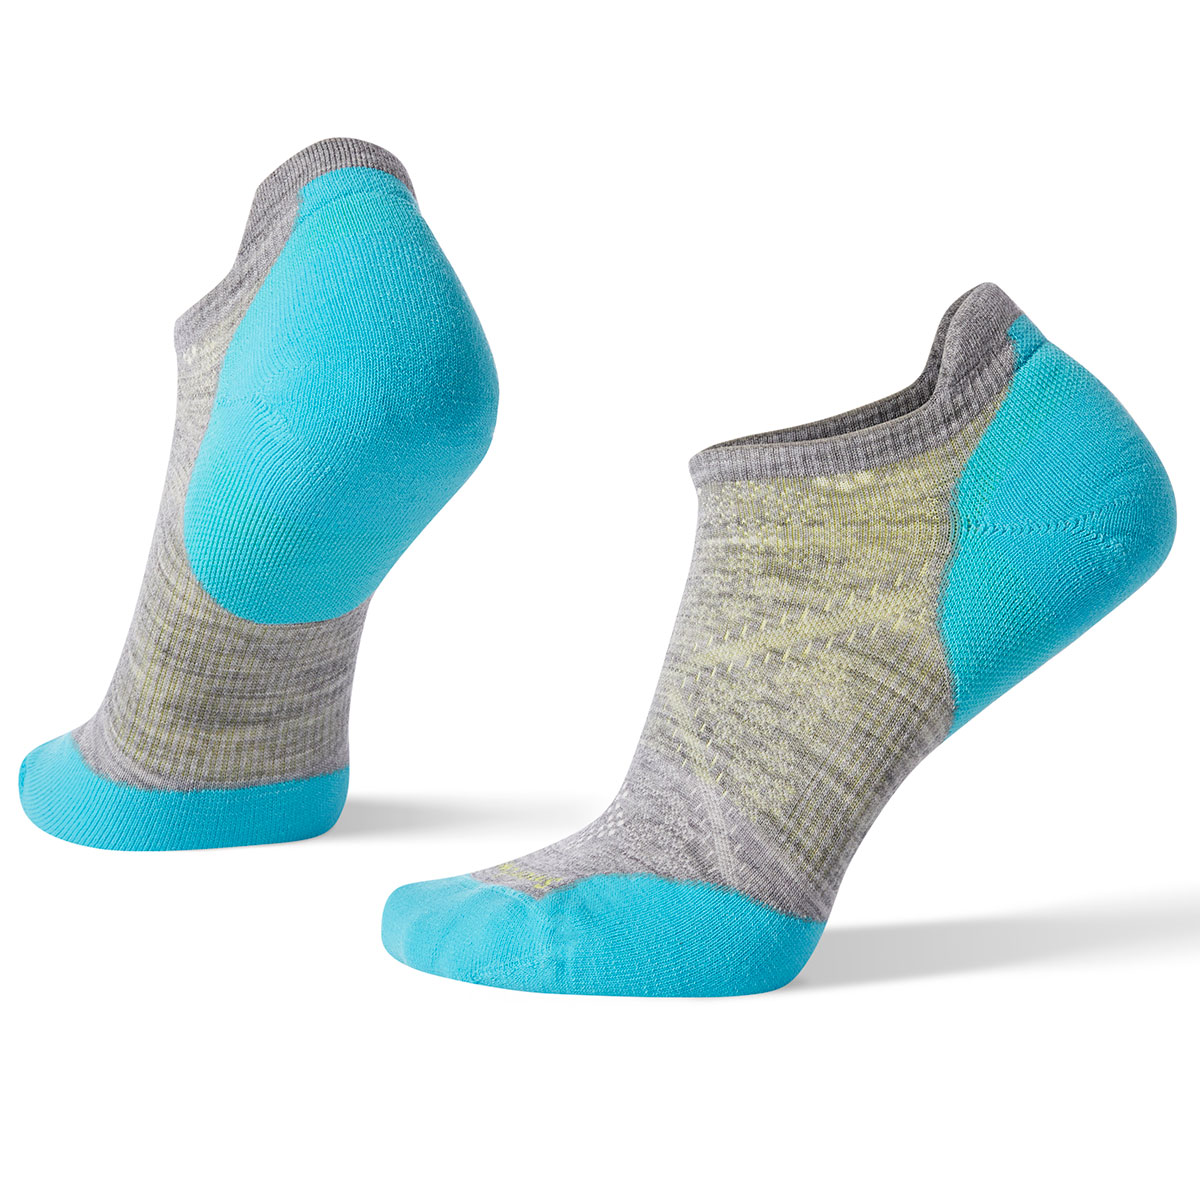 Smartwool Women's Phd Run Light Elite Micro Socks - Black, M